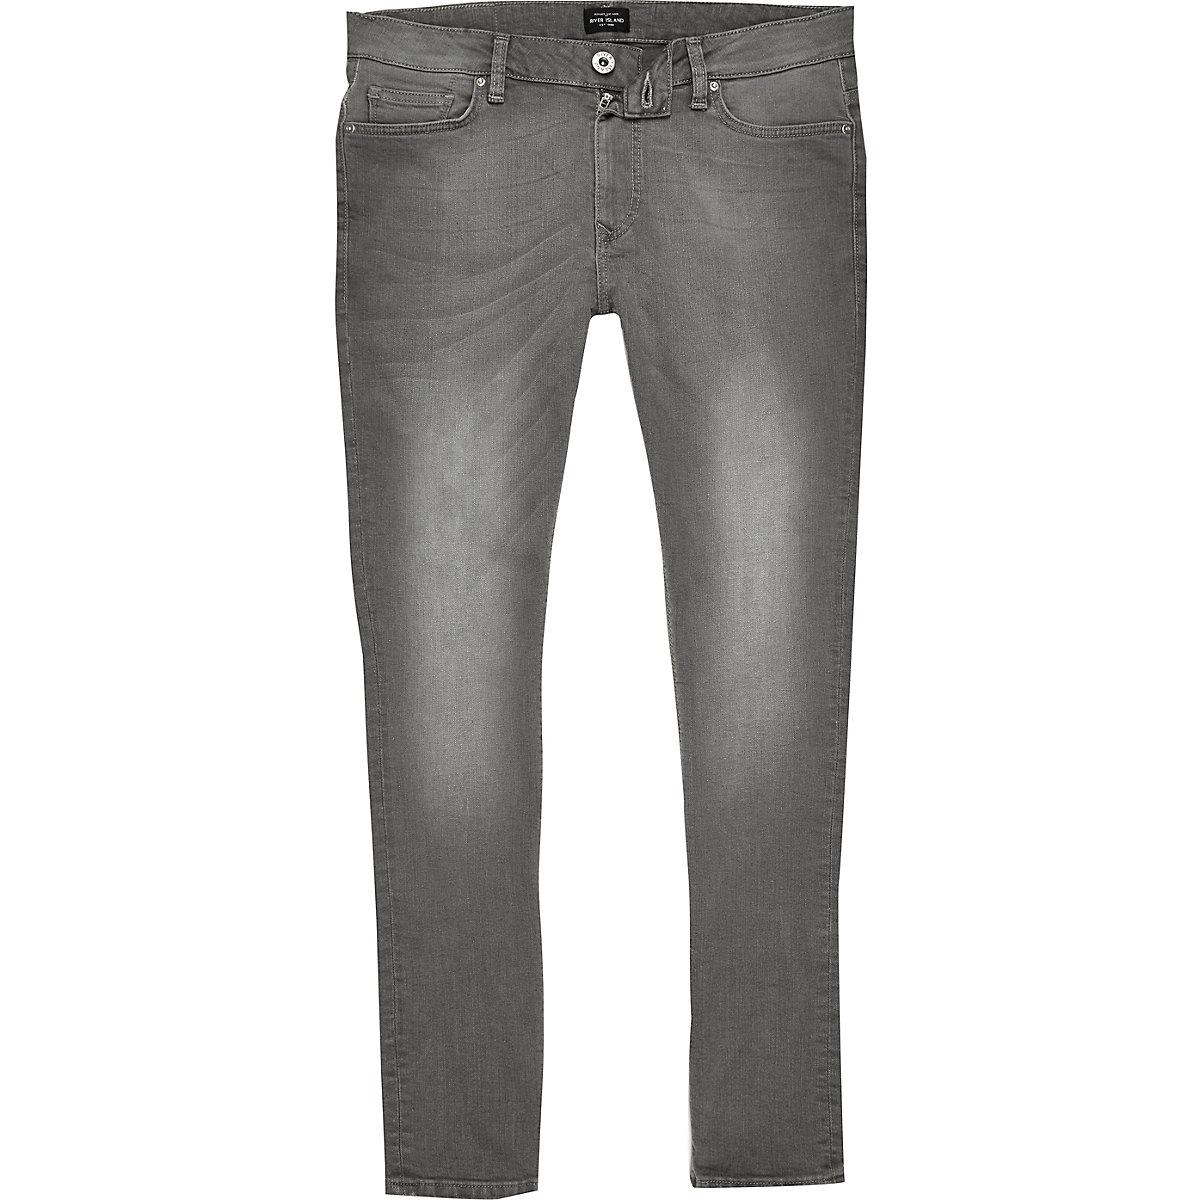 Grey wash Danny super skinny jeans